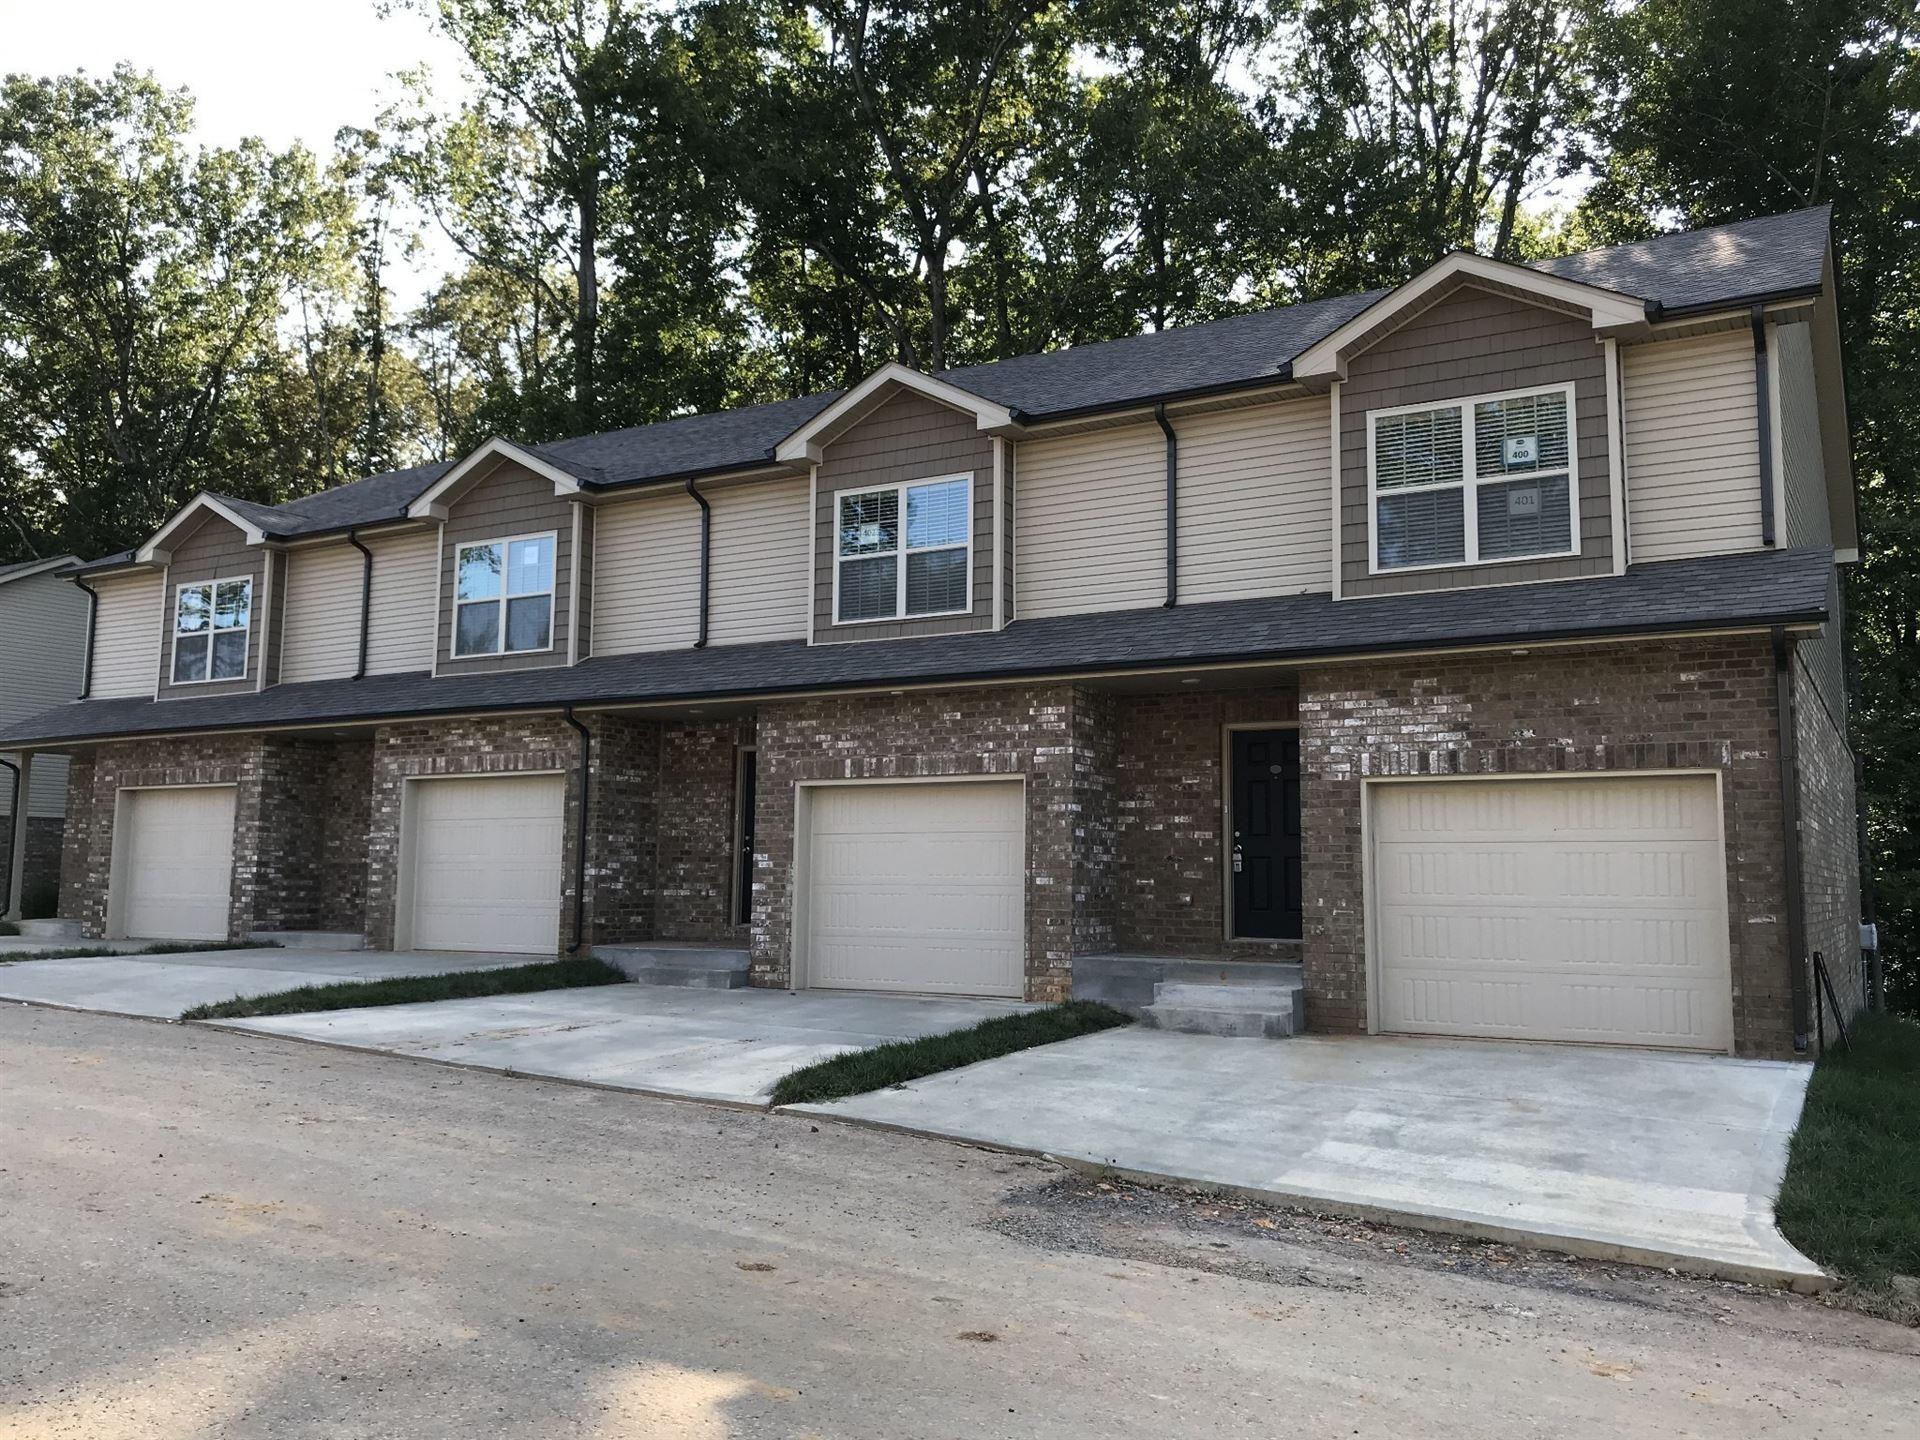 135 Country Lane Unit 603, Clarksville, TN 37043 - MLS#: 2177042